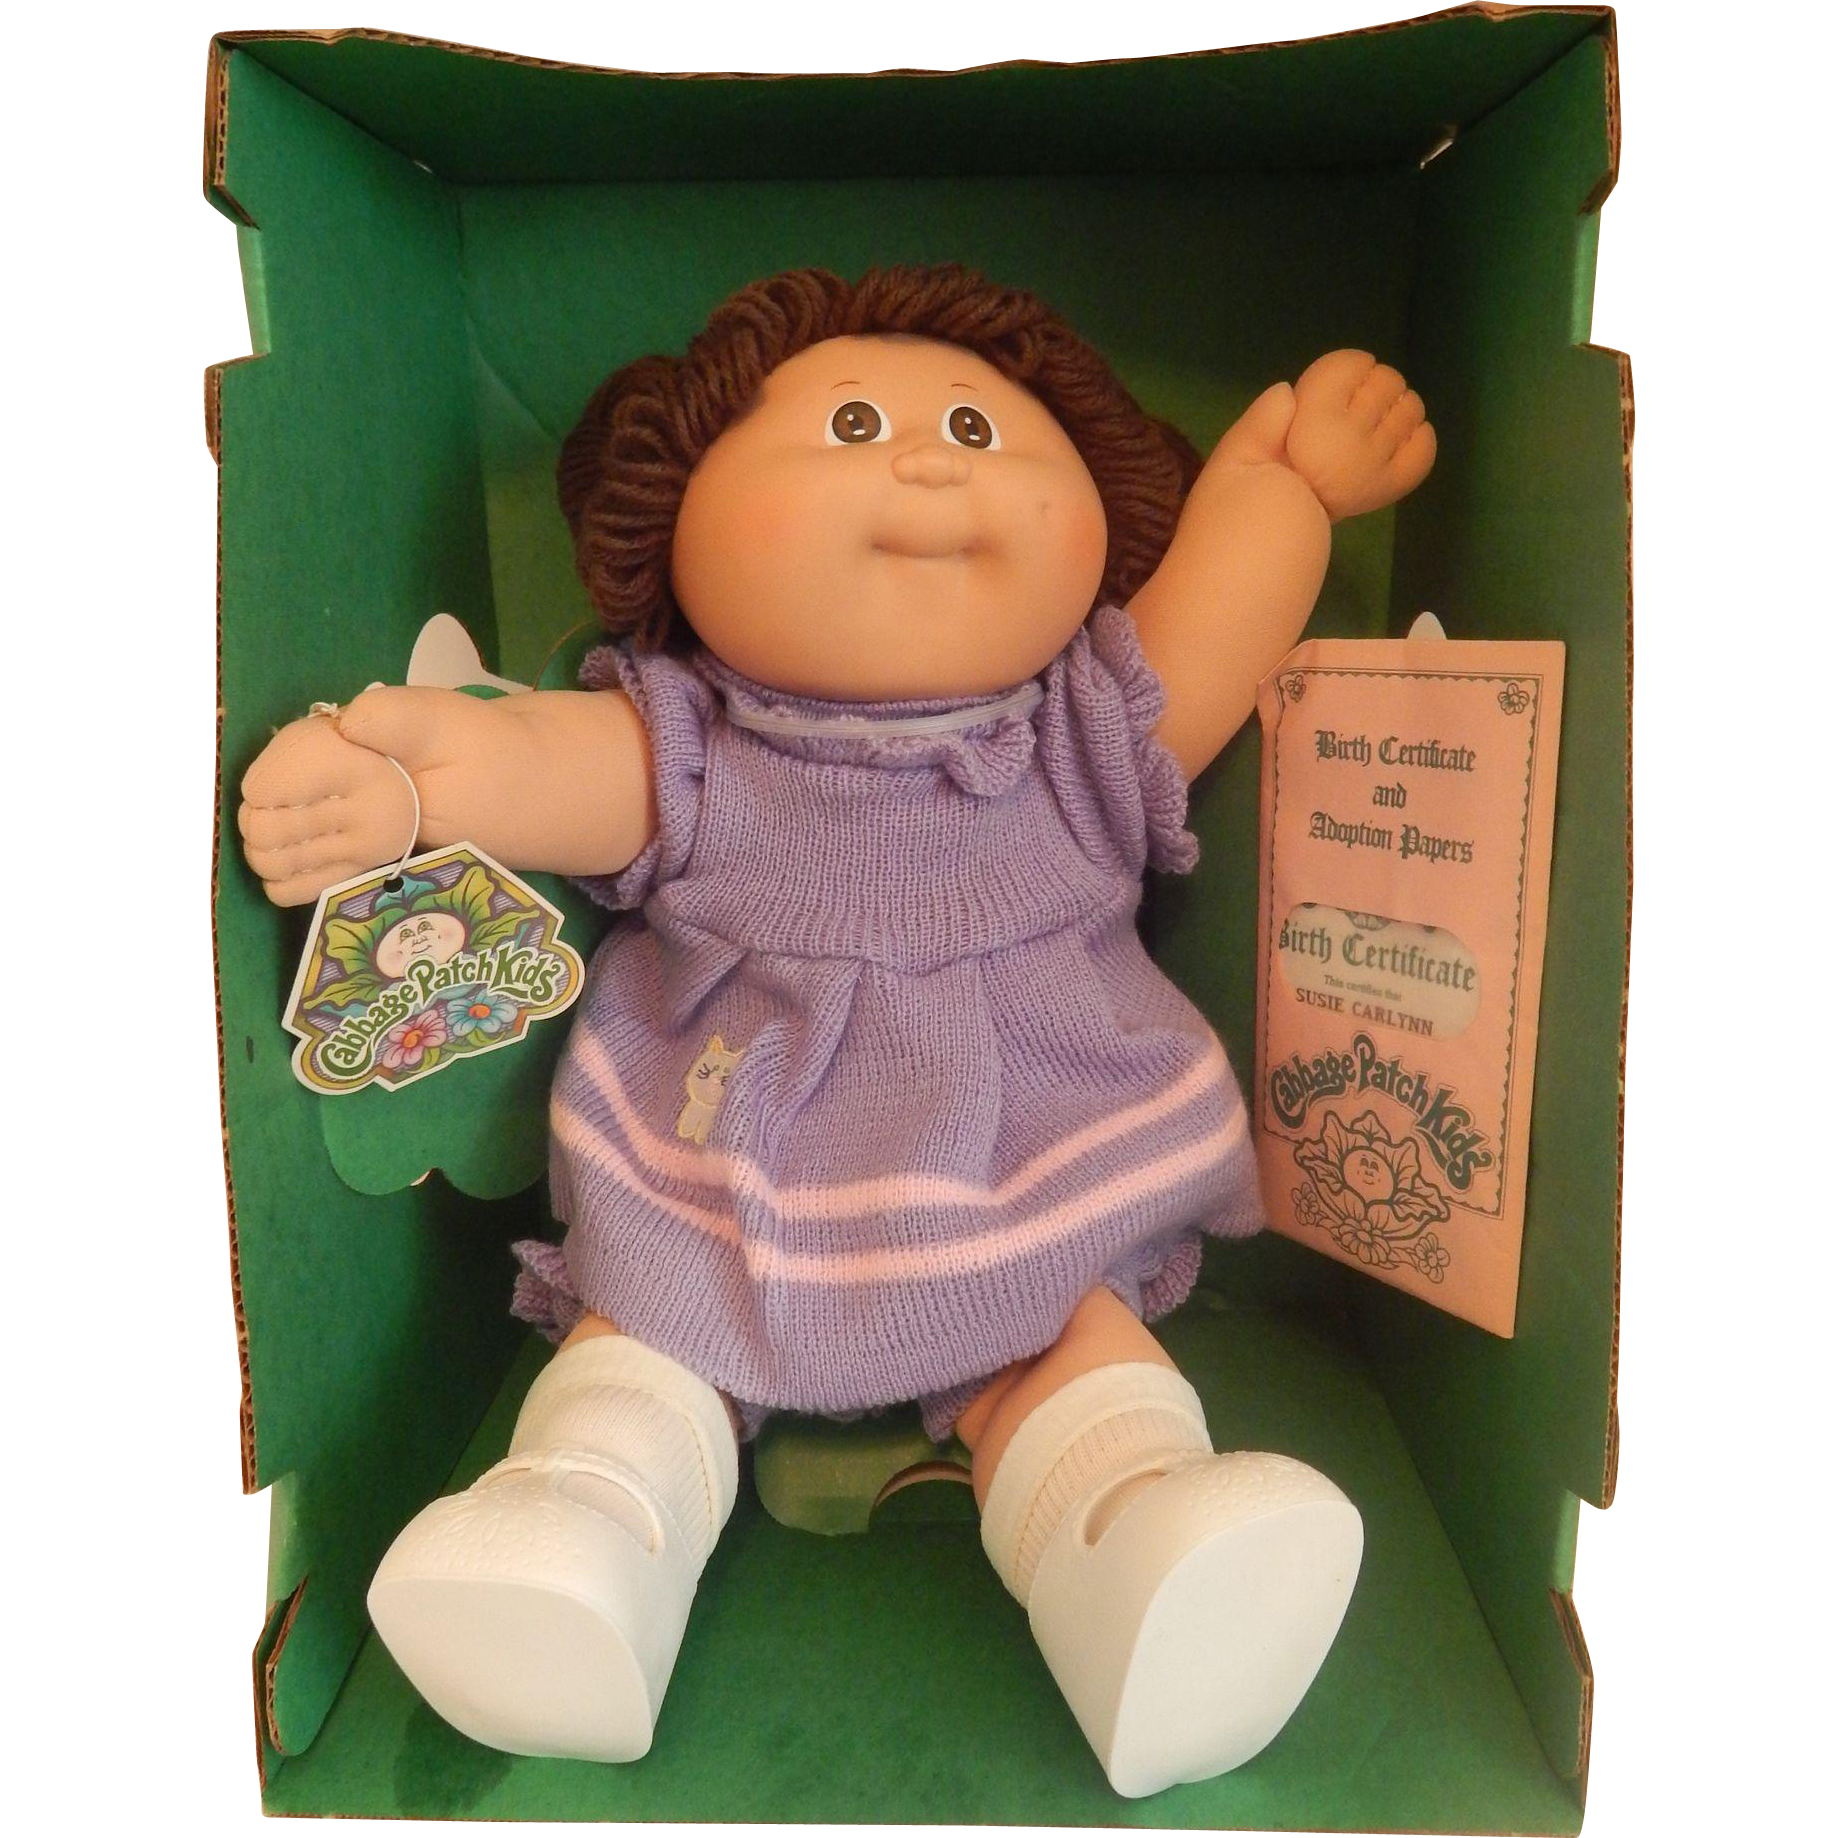 Cabbage Patch Kids Doll 1984 Cabbage Patch Kids Cabbage Patch Kids Dolls Patch Kids